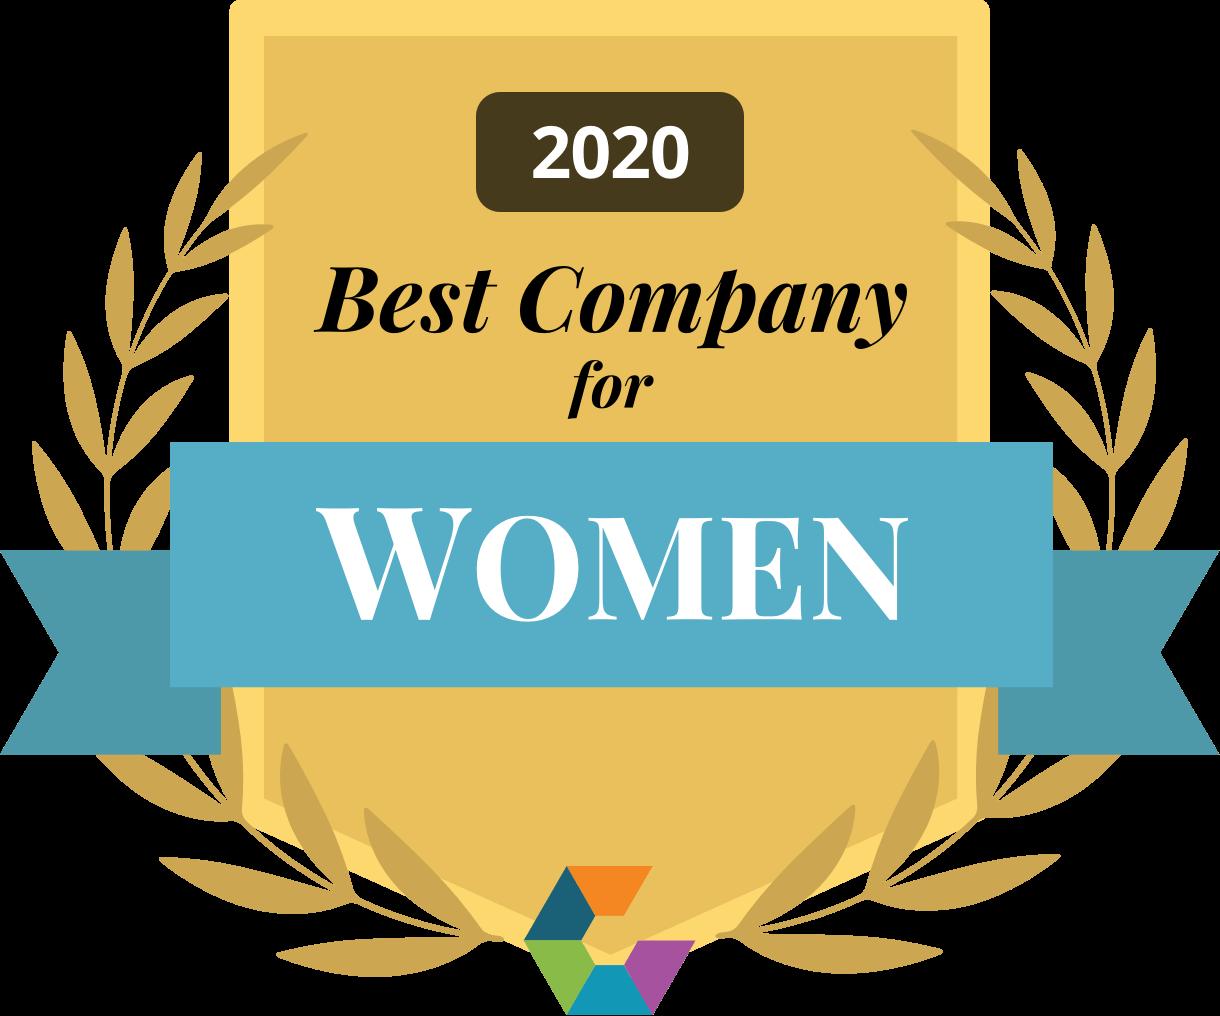 Best Company for Women 2020